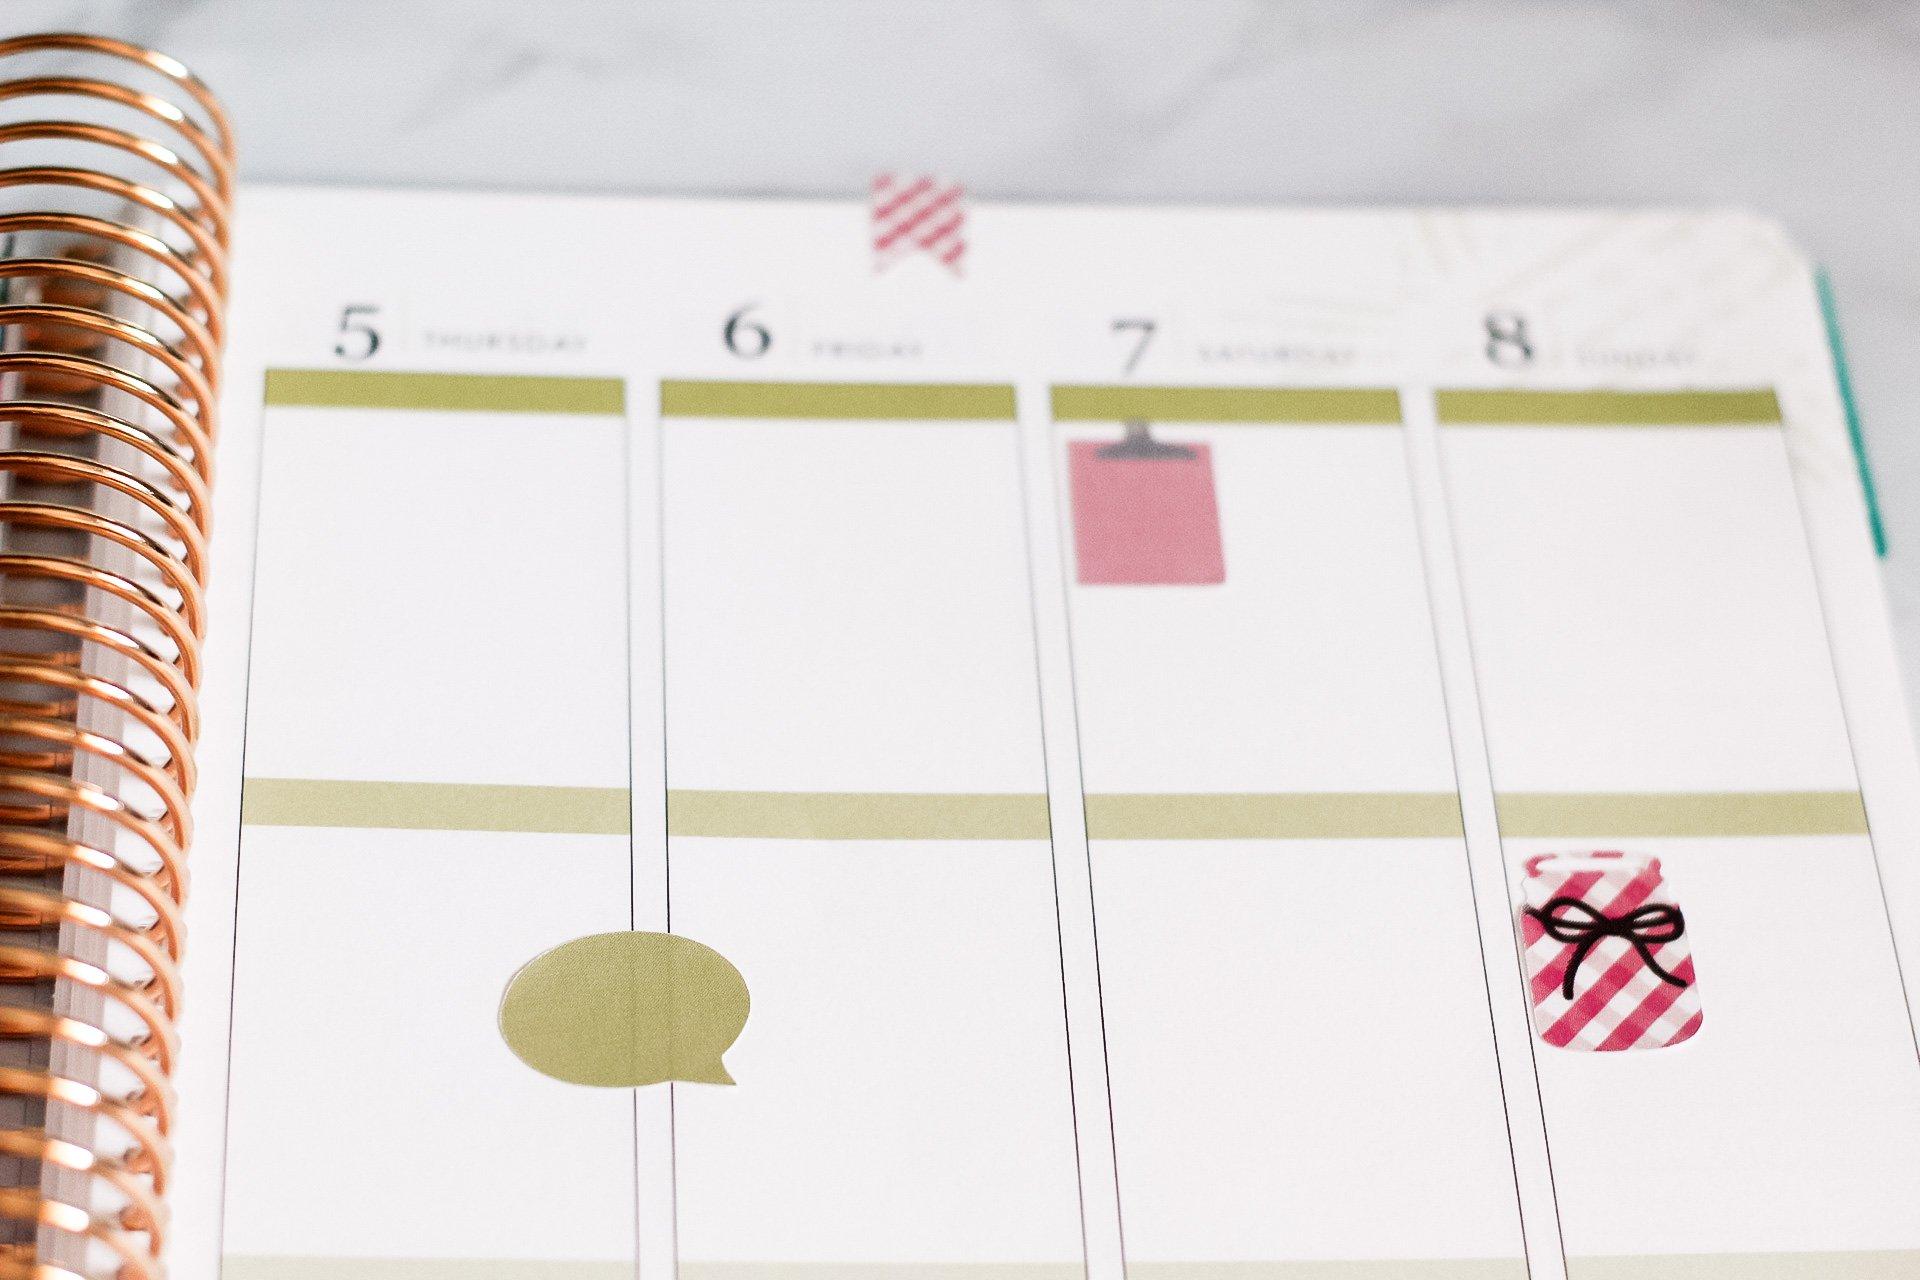 diy stickers in planner